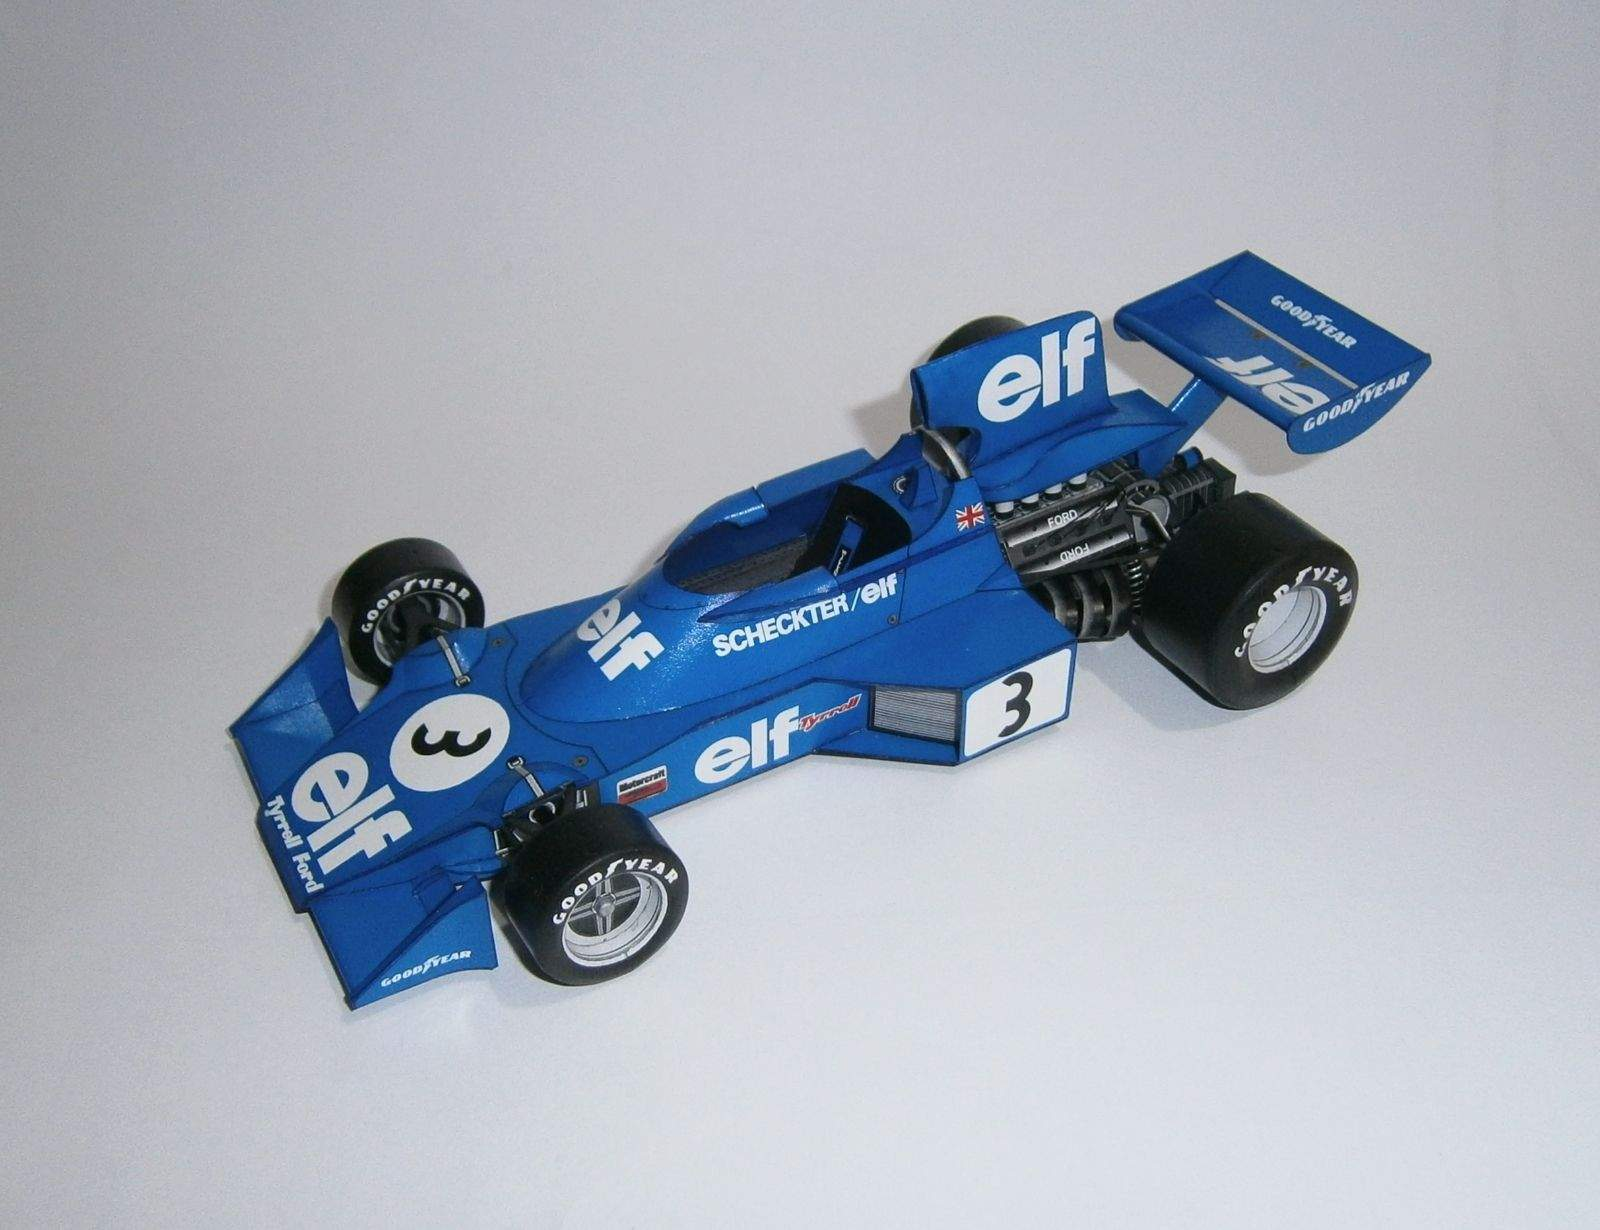 Tyrrell Ford 007 - J.Scheckter, GP Swedish 1974